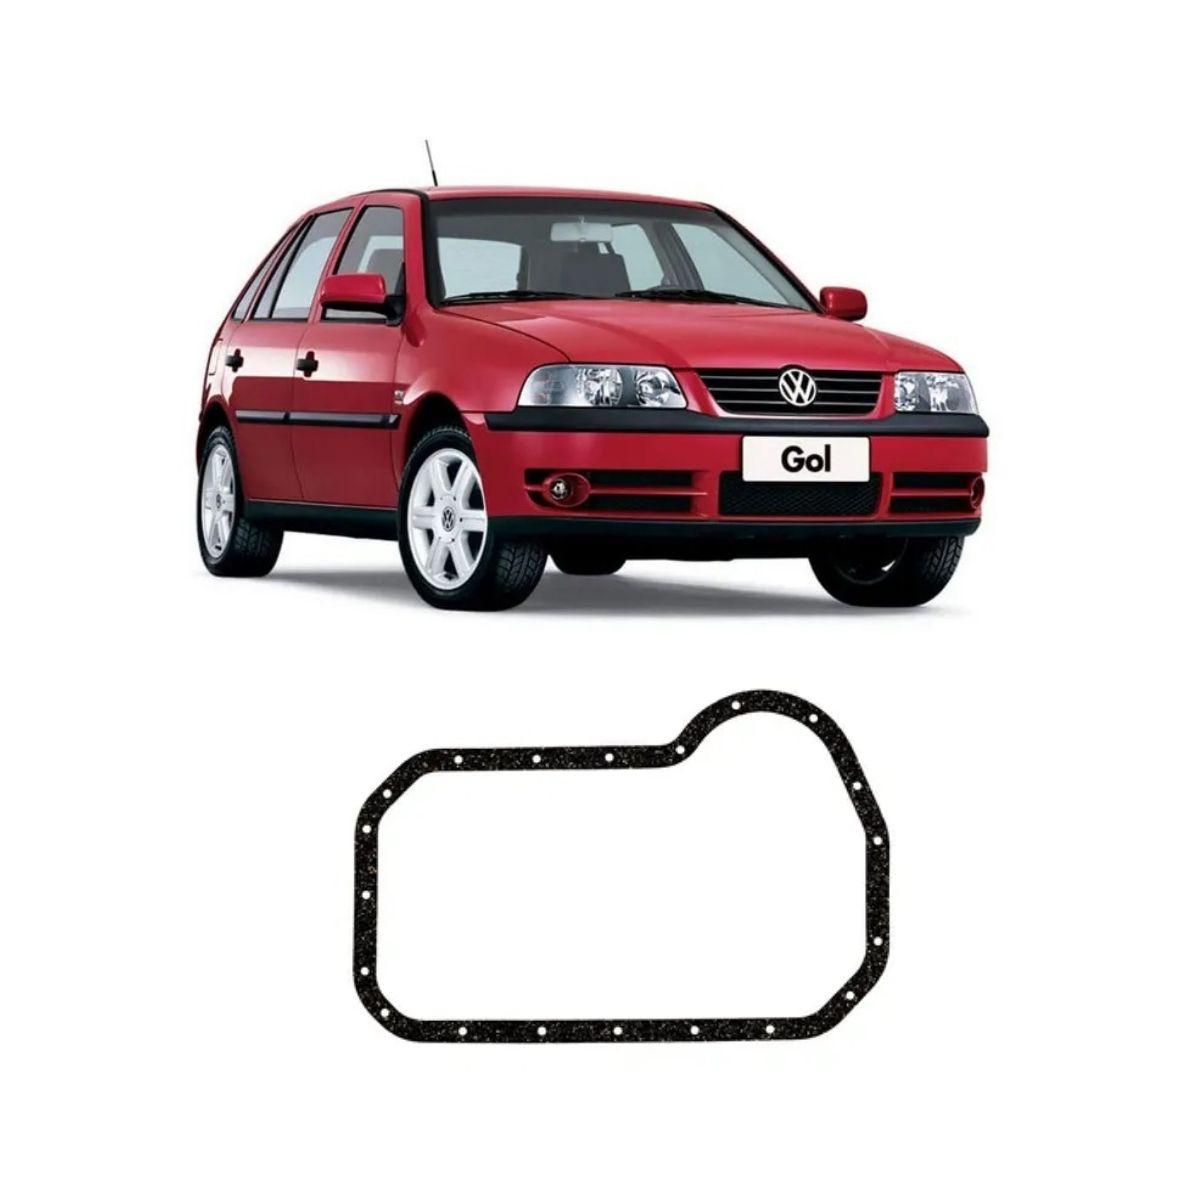 Junta Cárter Baspack Volkswagen Gol 1985/2008